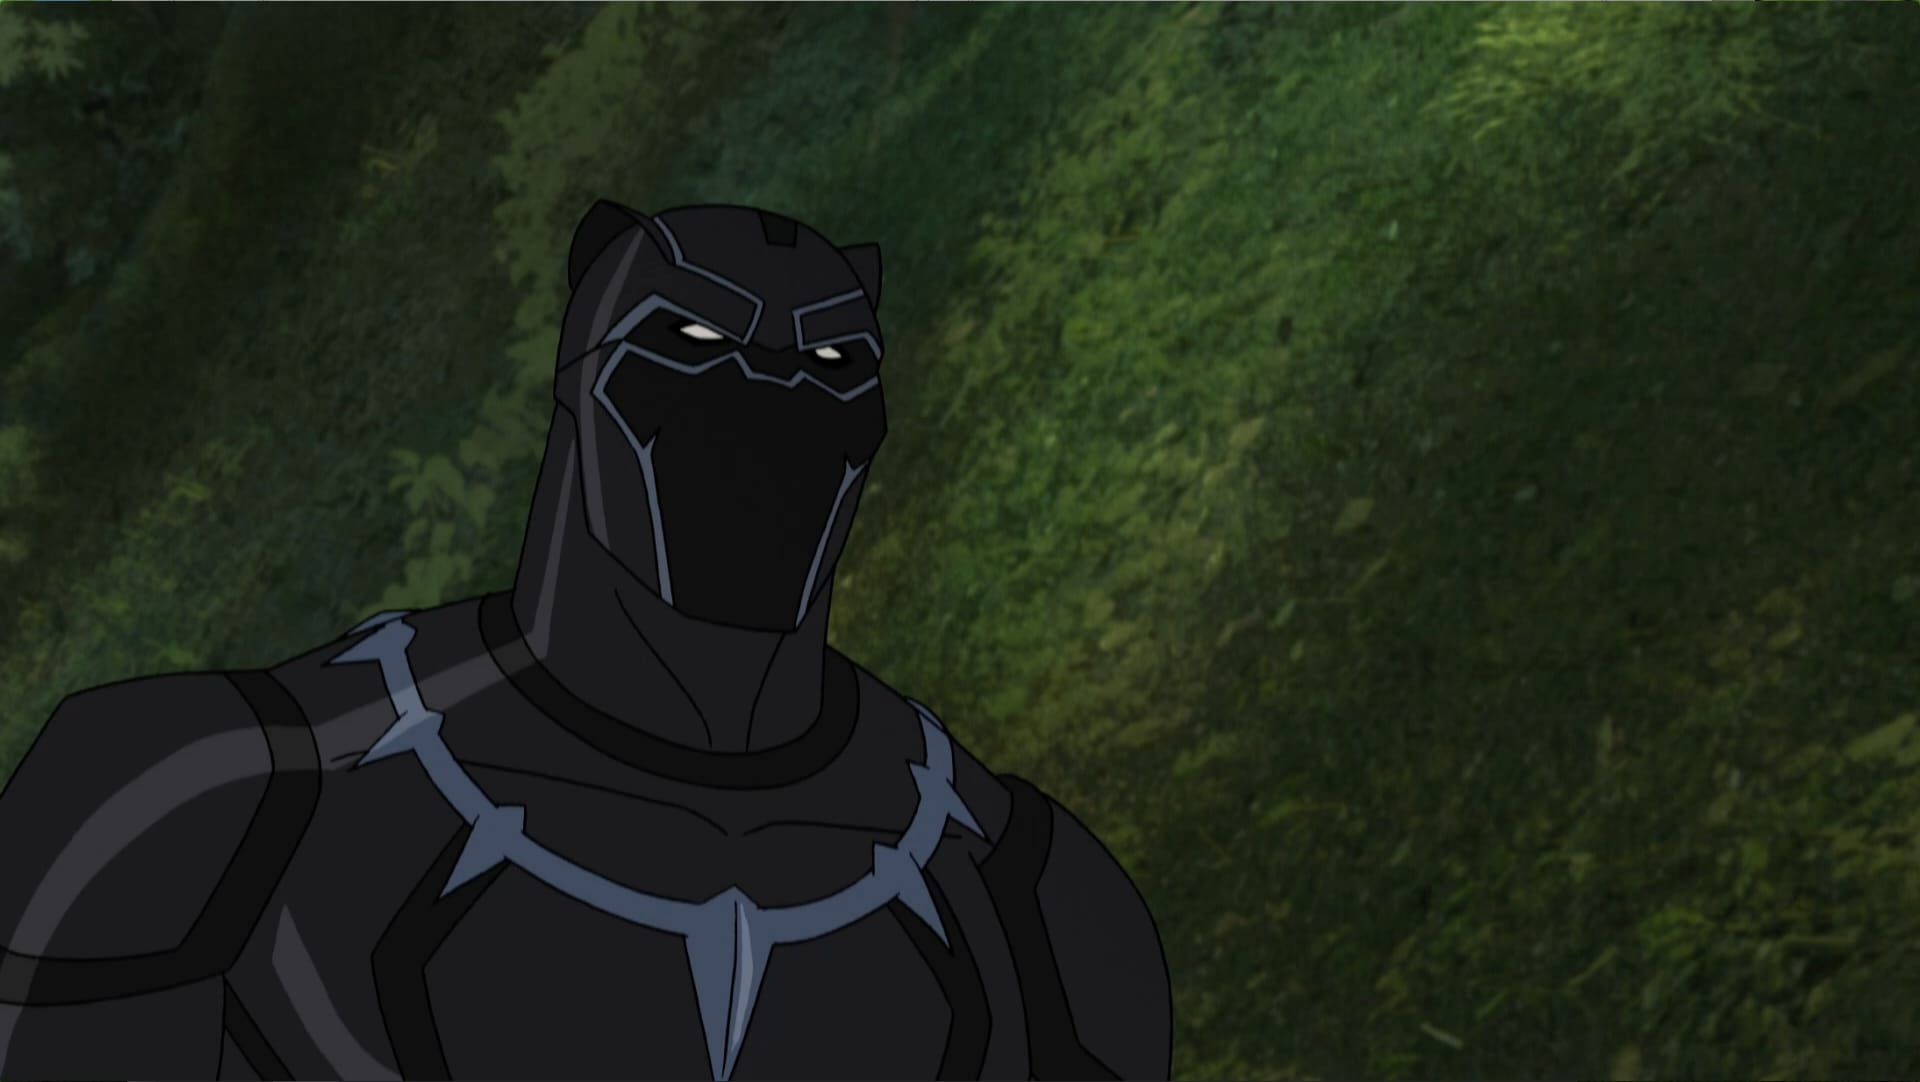 Los Vengadores de Marvel: Guerras secretas - Pantera Negra